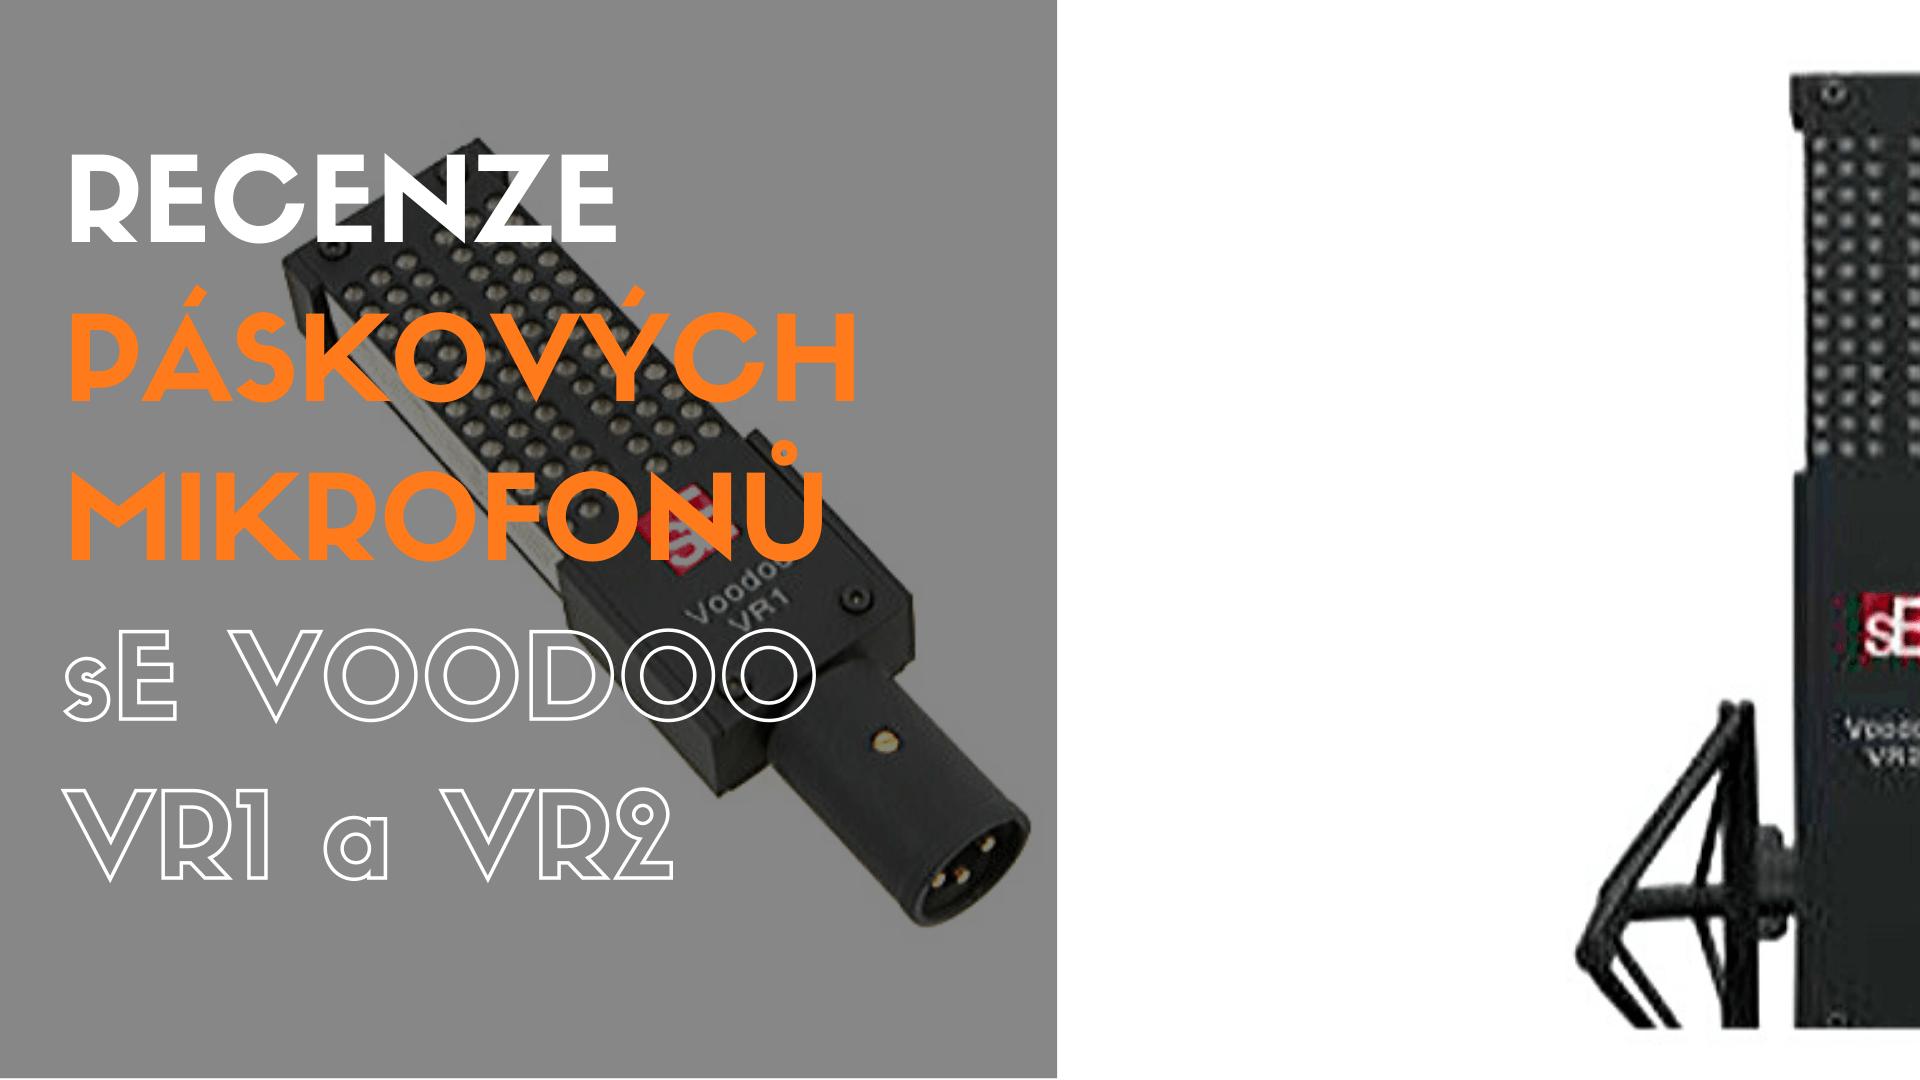 Recenze páskových mikrofonu sE Voodoo VR1 a VR2